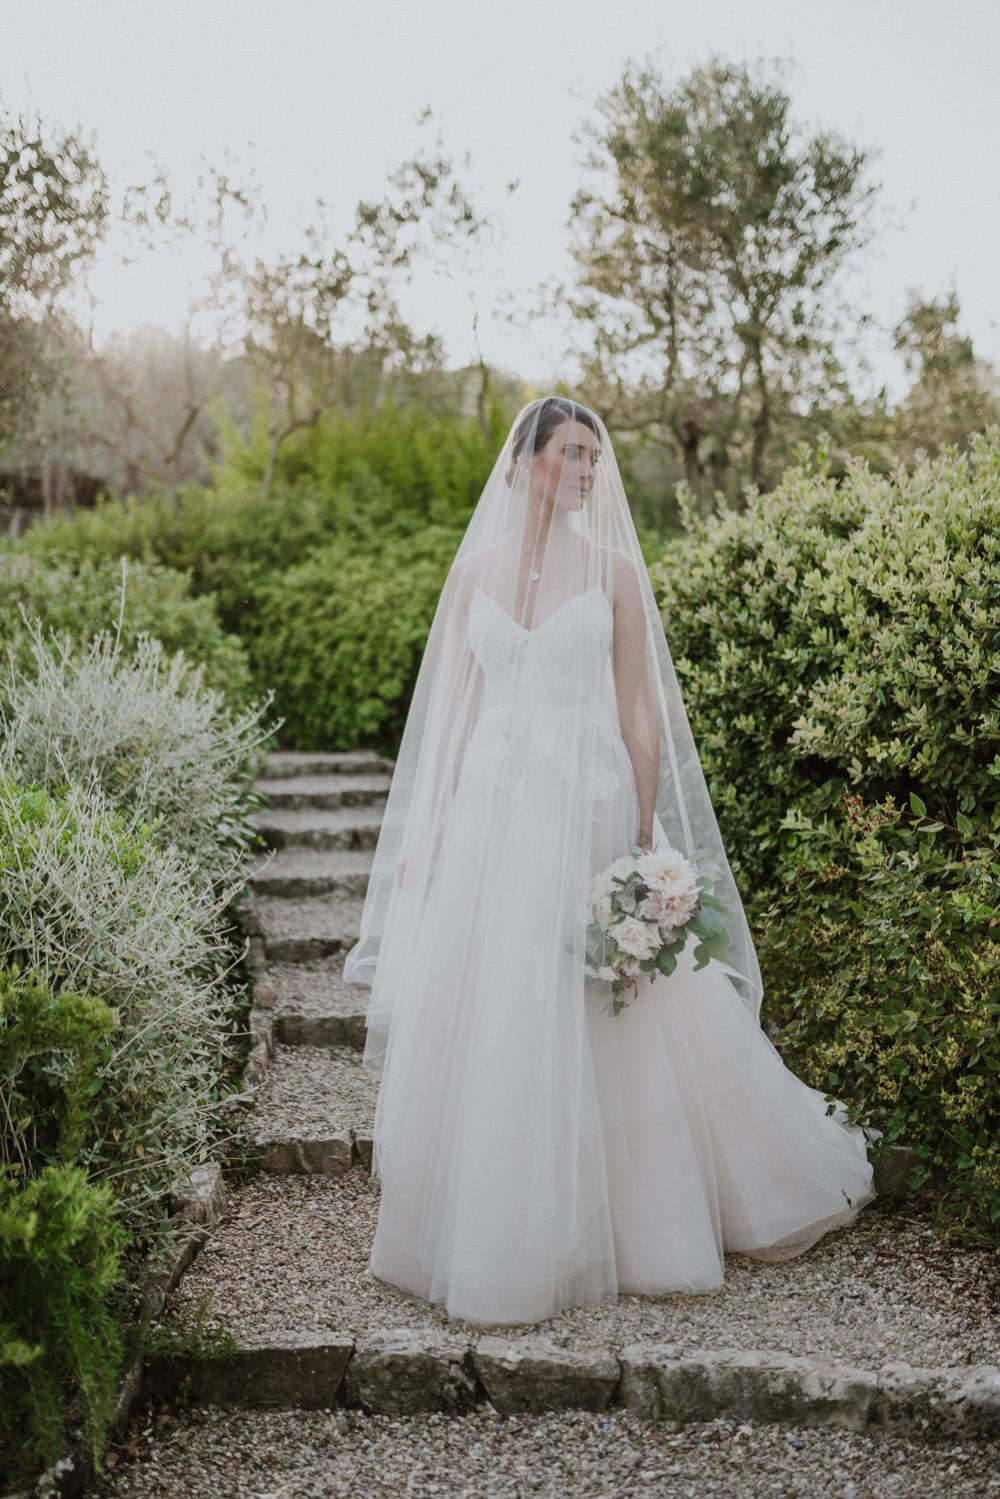 Romantic Jewish Wedding in Chianti Tuscany - Laura Bravi Events